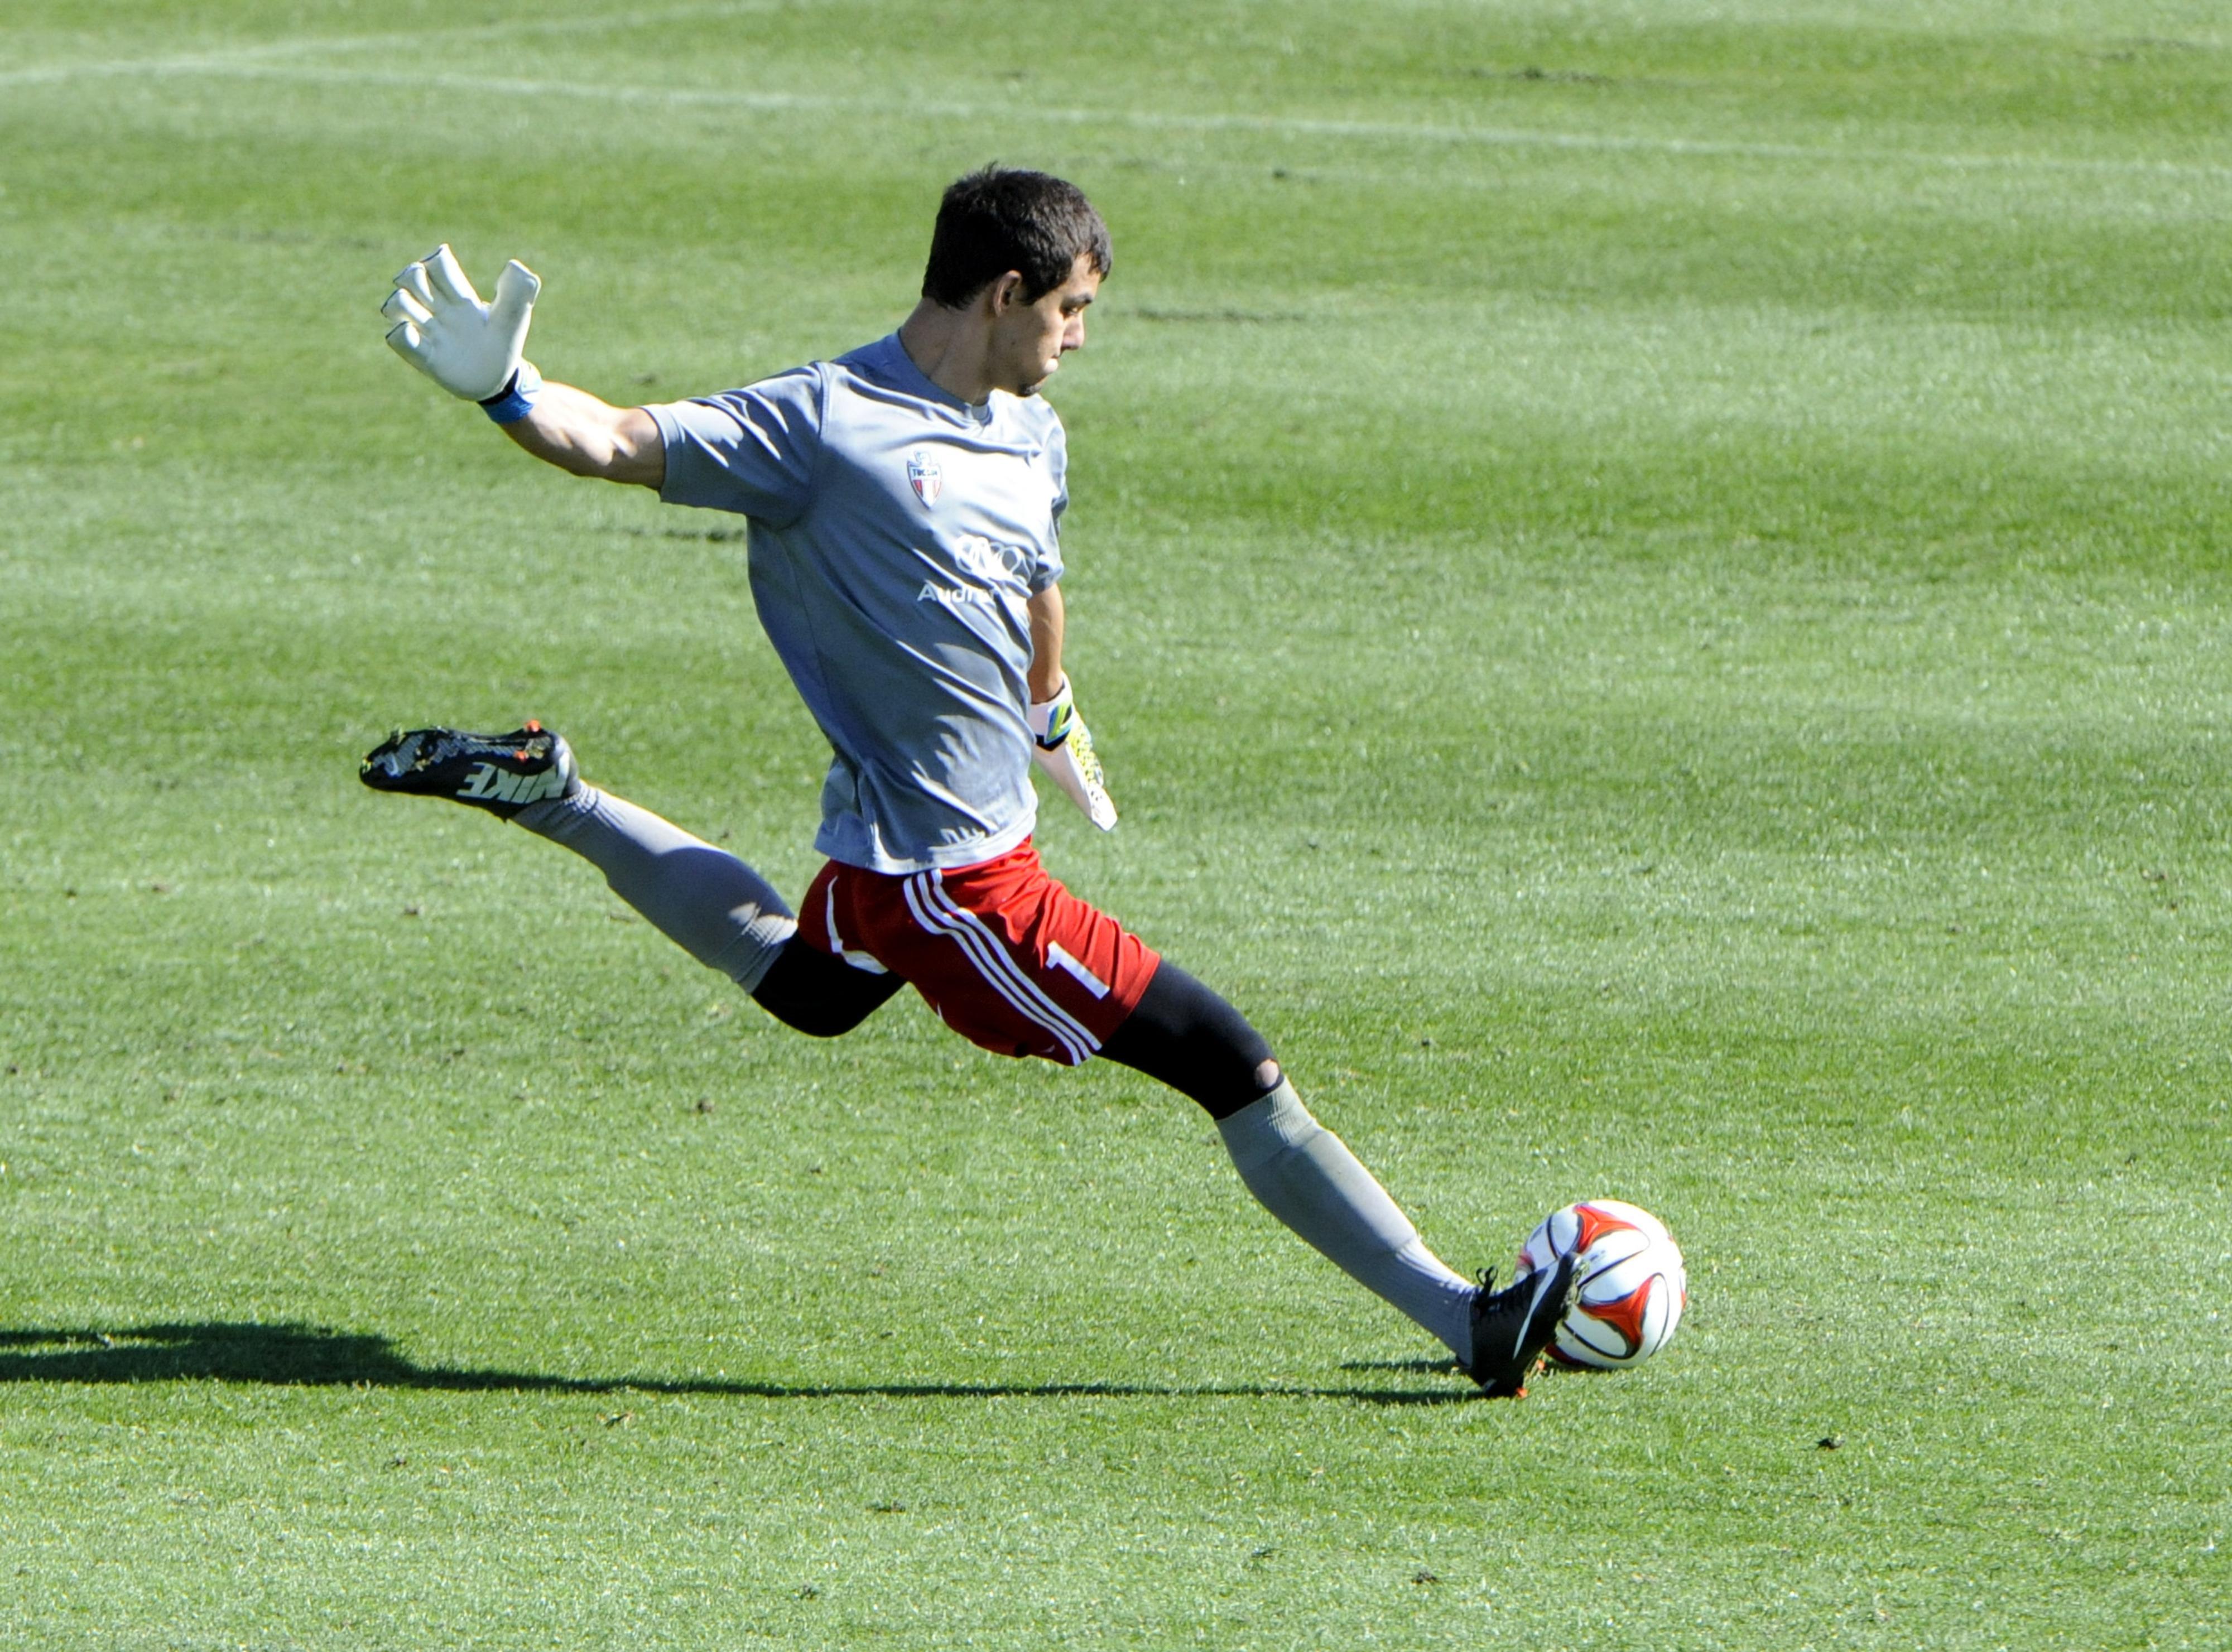 FC Tucson goalkeeper Michael D'Arrigo